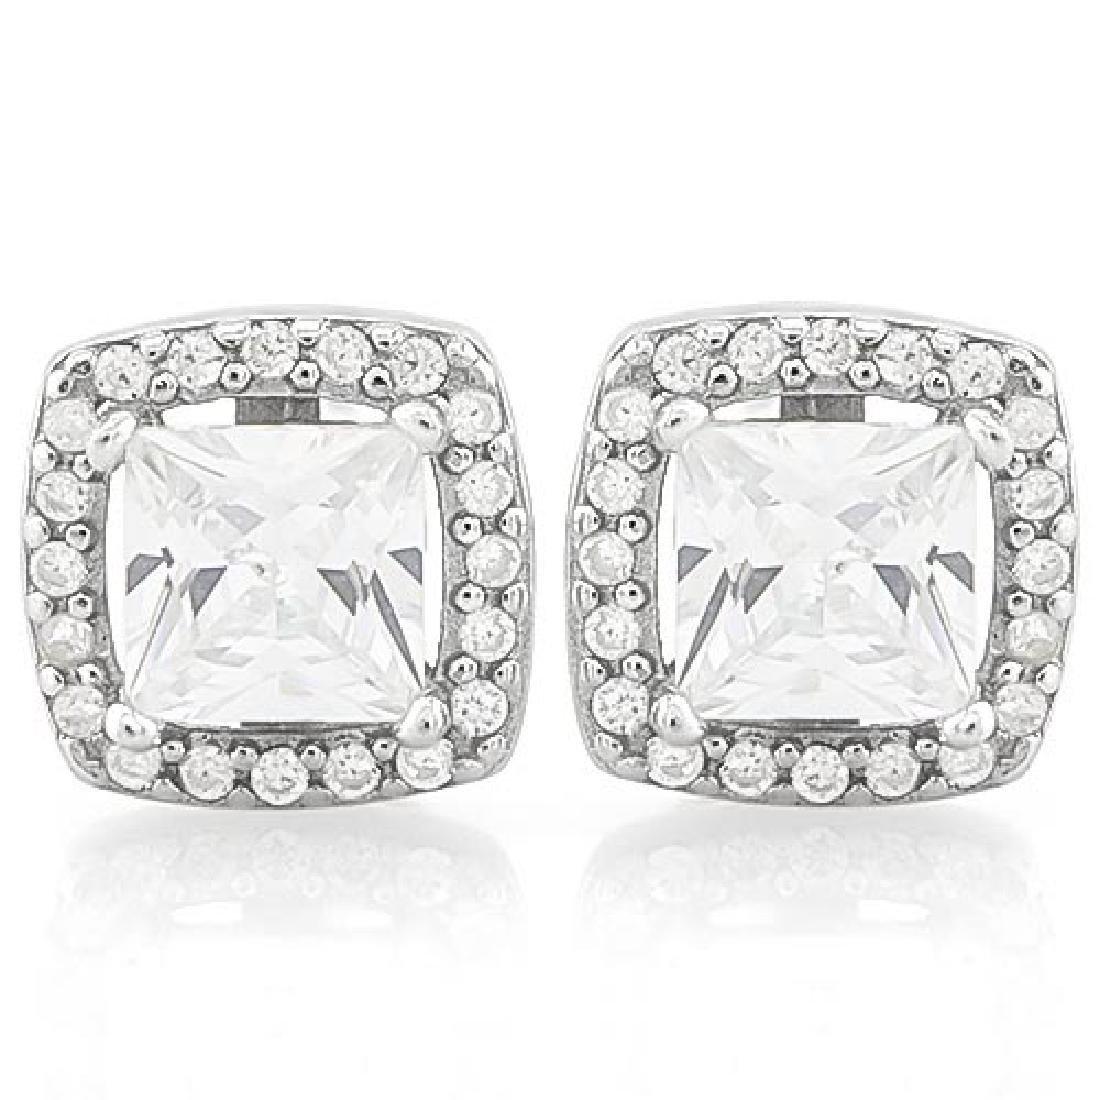 7 CARAT (42 PCS) FLAWLESS CREATED DIAMOND 925 STERLING